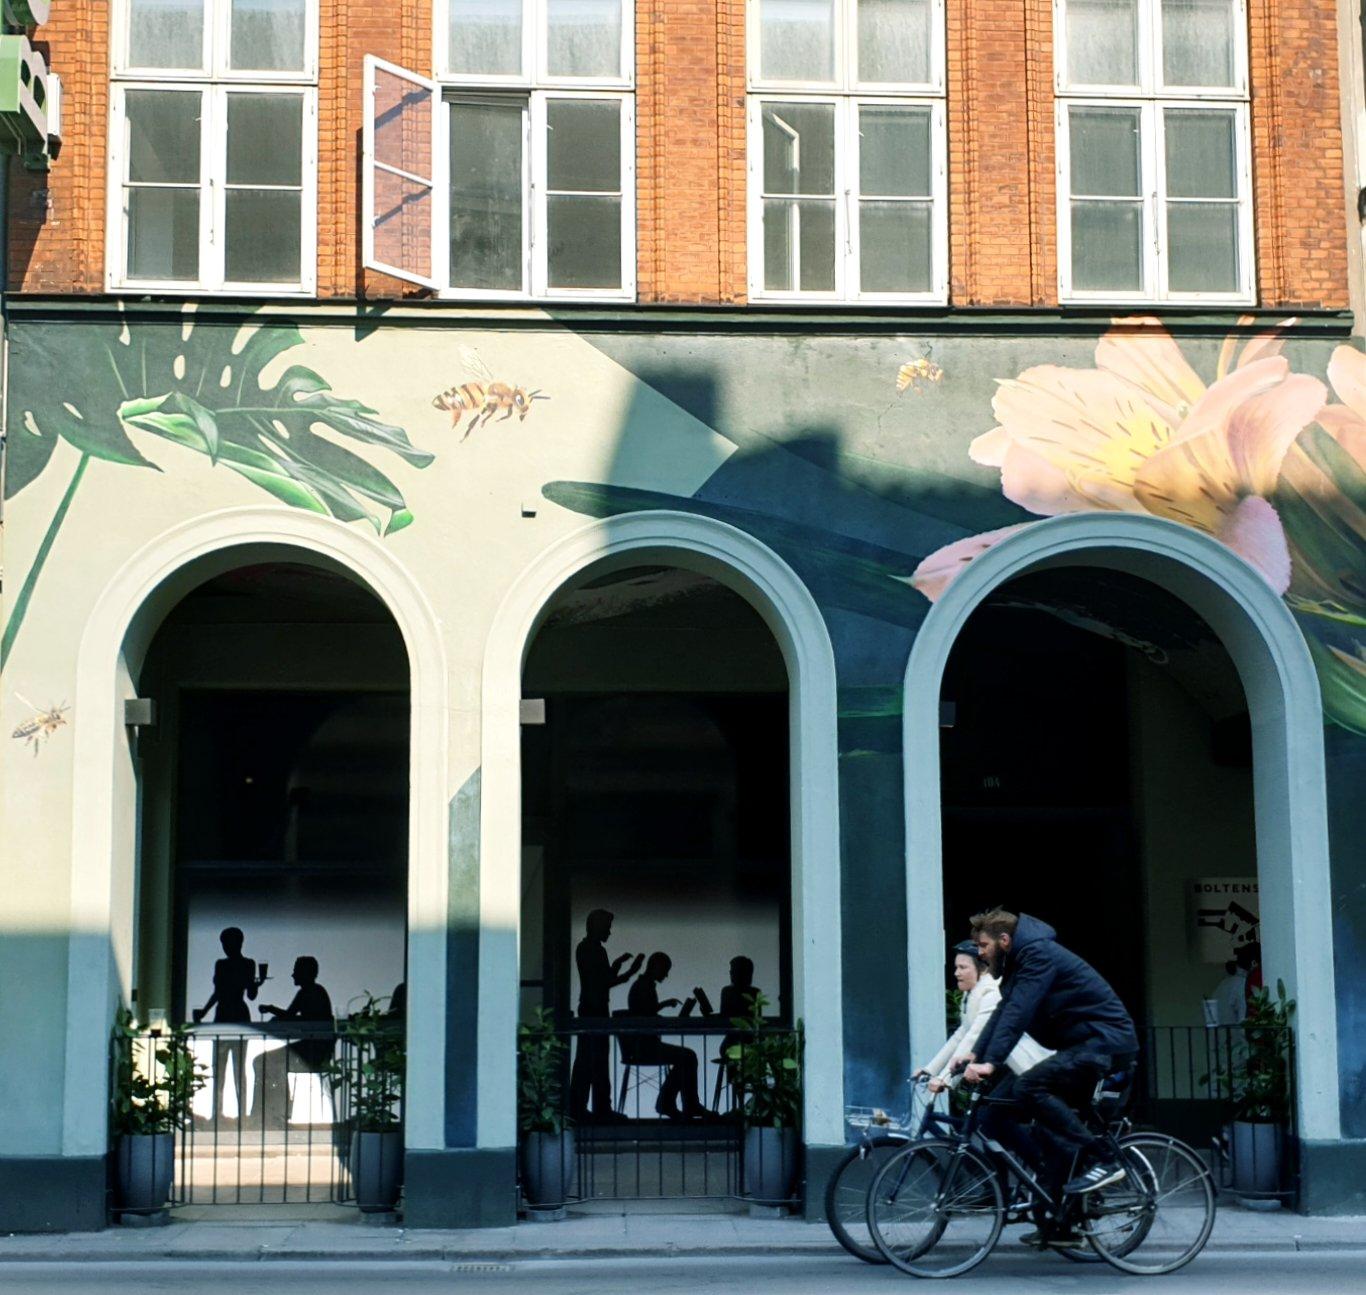 La Copenhagen Classica per me